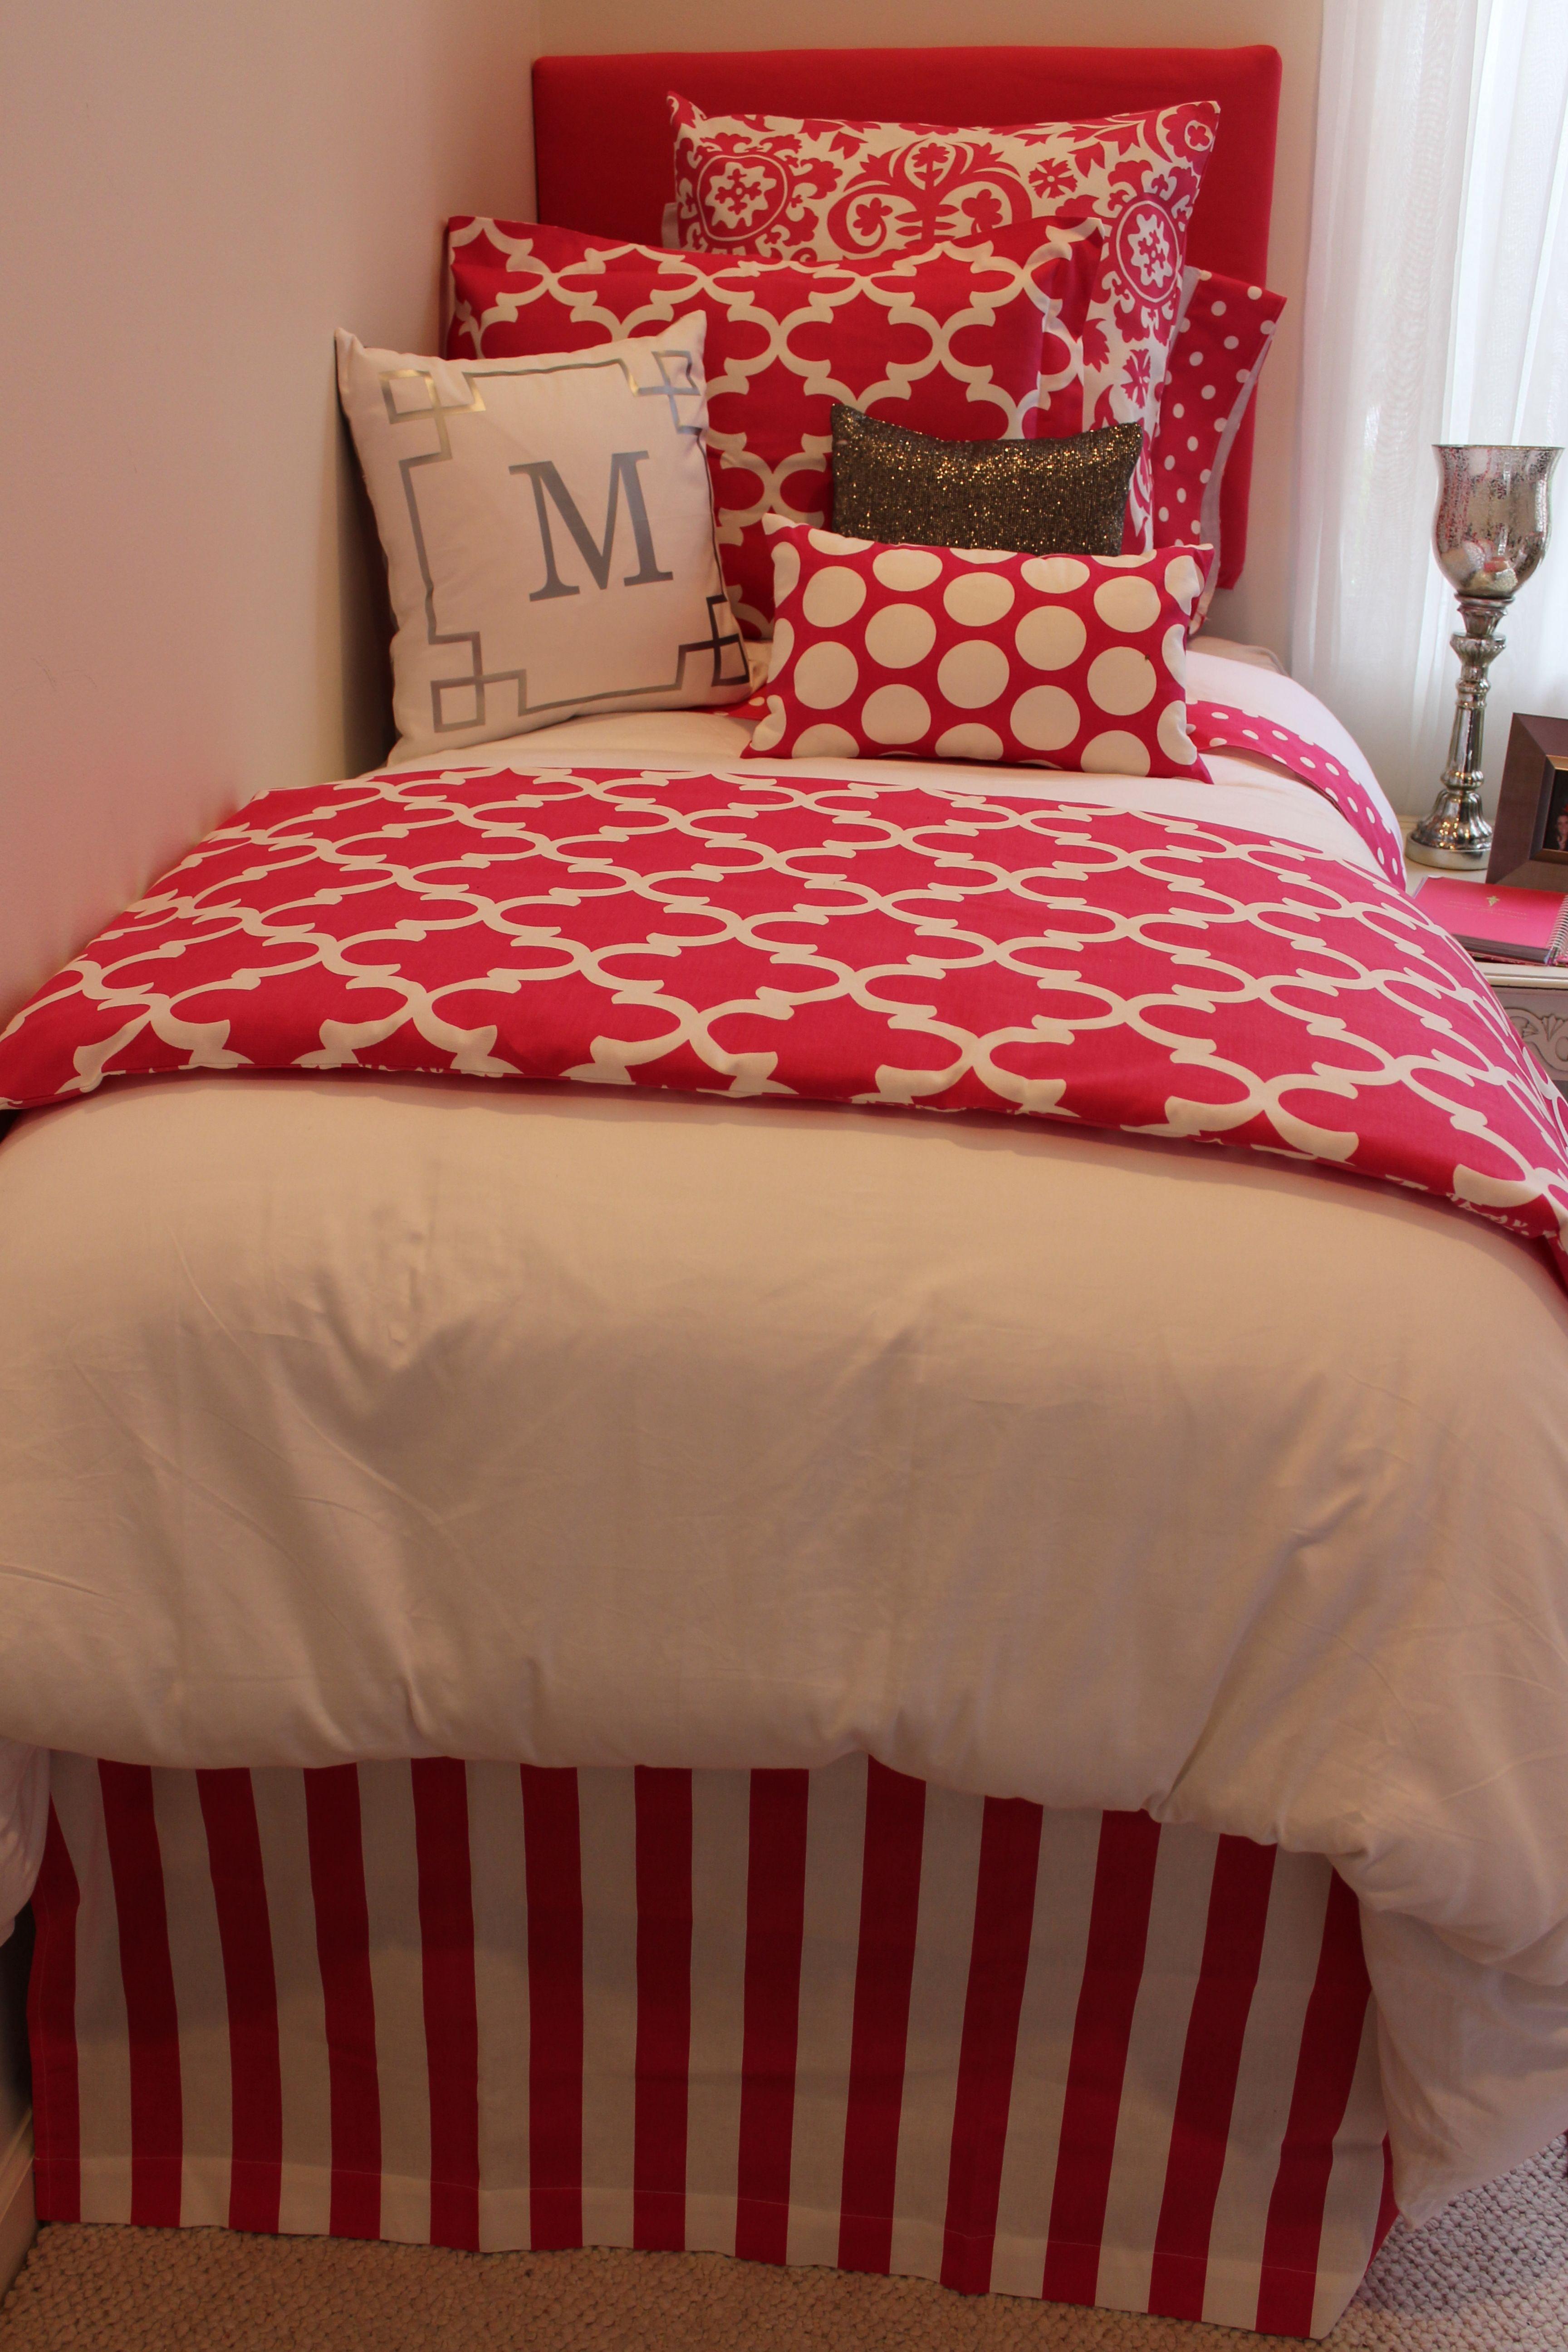 Dorm Bedding Decor Designer Dorm Room Bedding Beautiful Patterns And Dorm